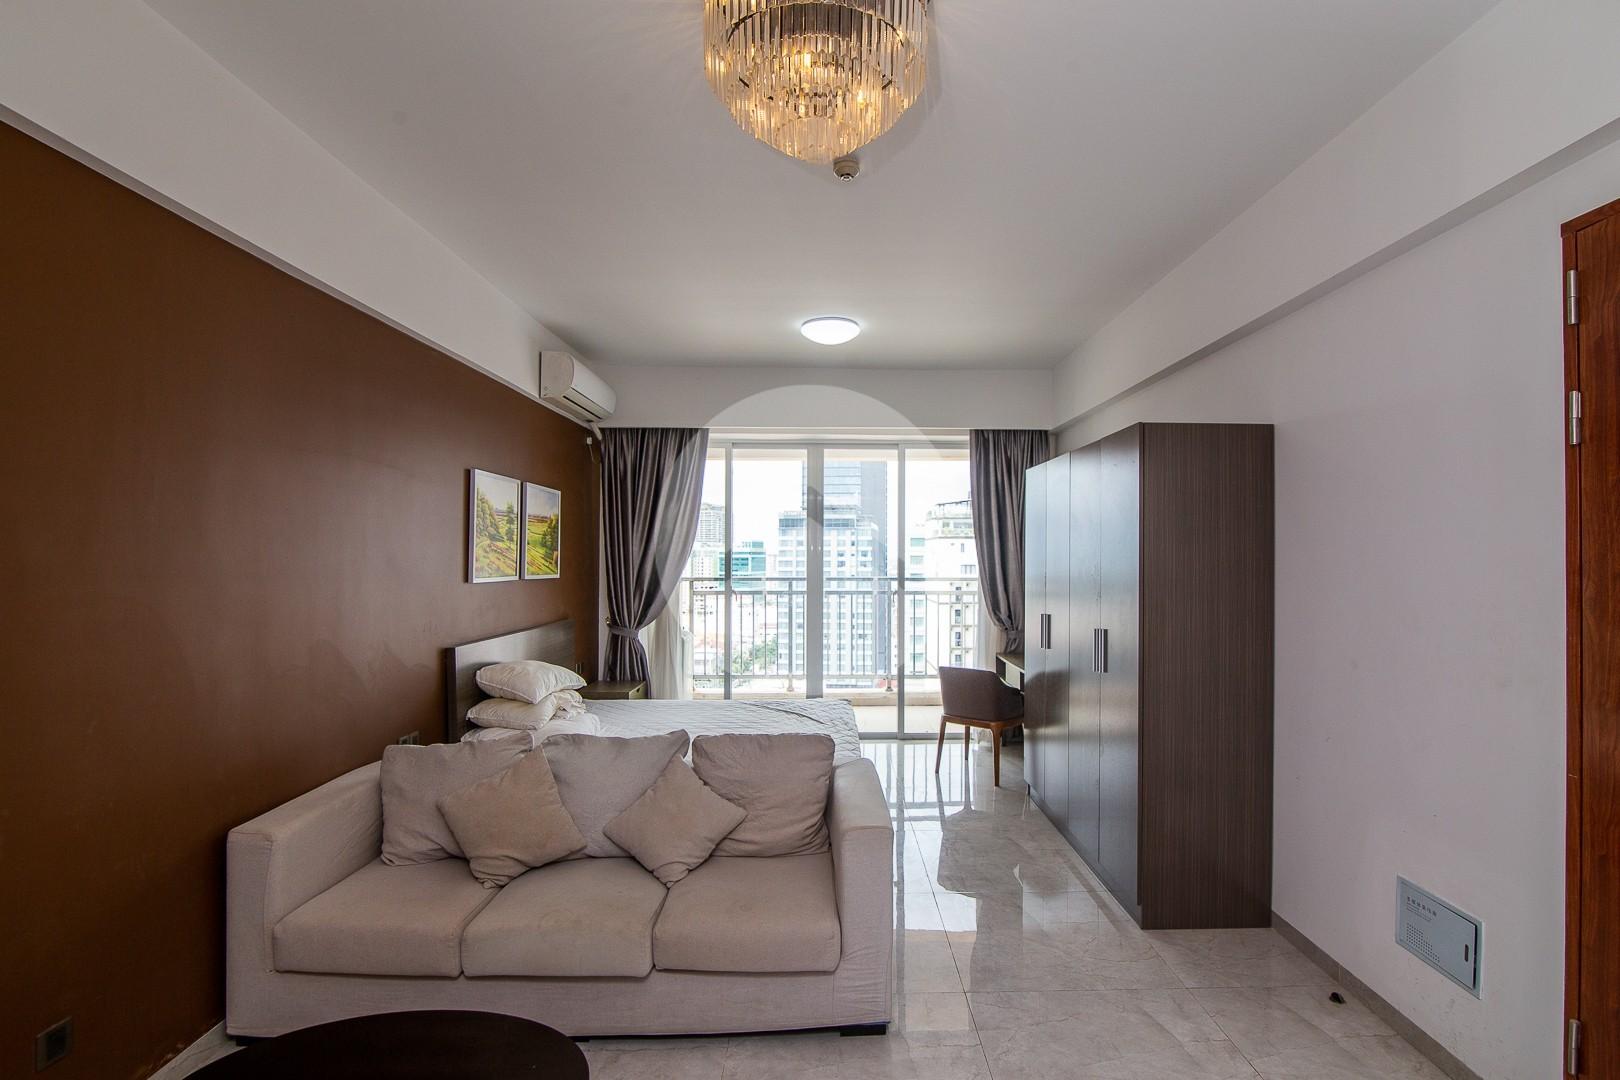 45 Sqm Studio Condo For Rent - Beoung Riang, Phnom Penh